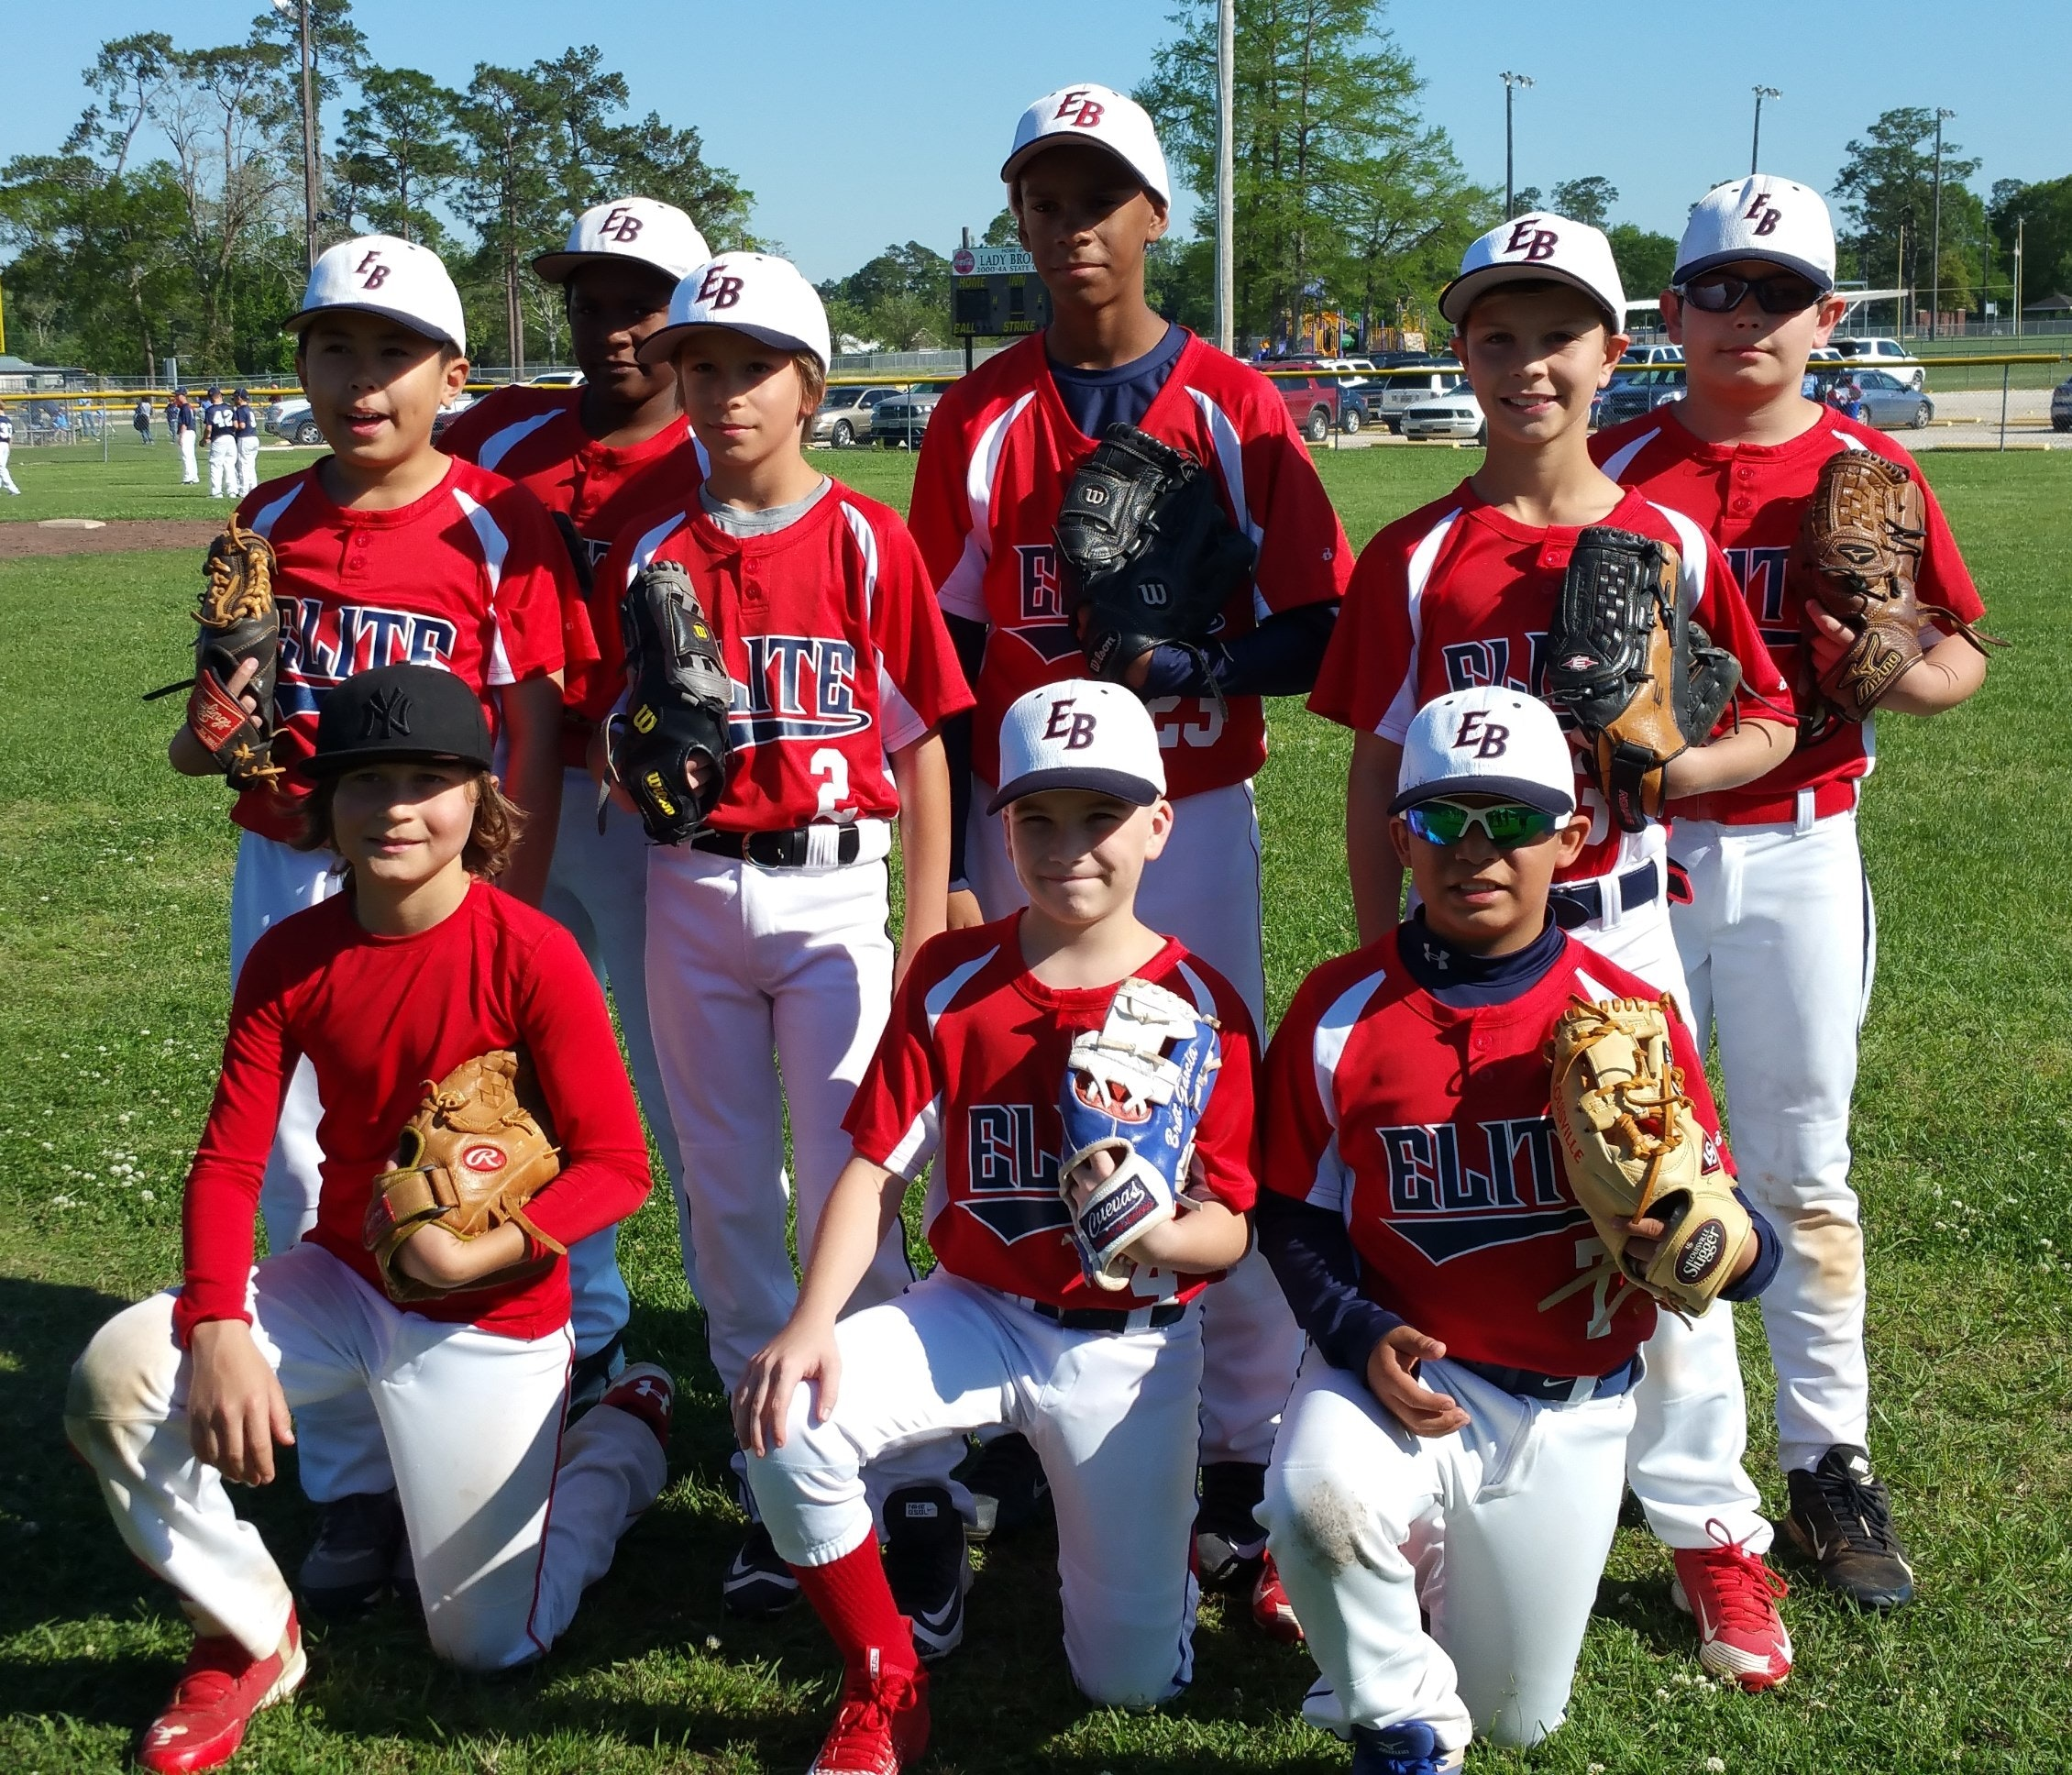 11U Katy Elite Baseball Nationals Fundraiser